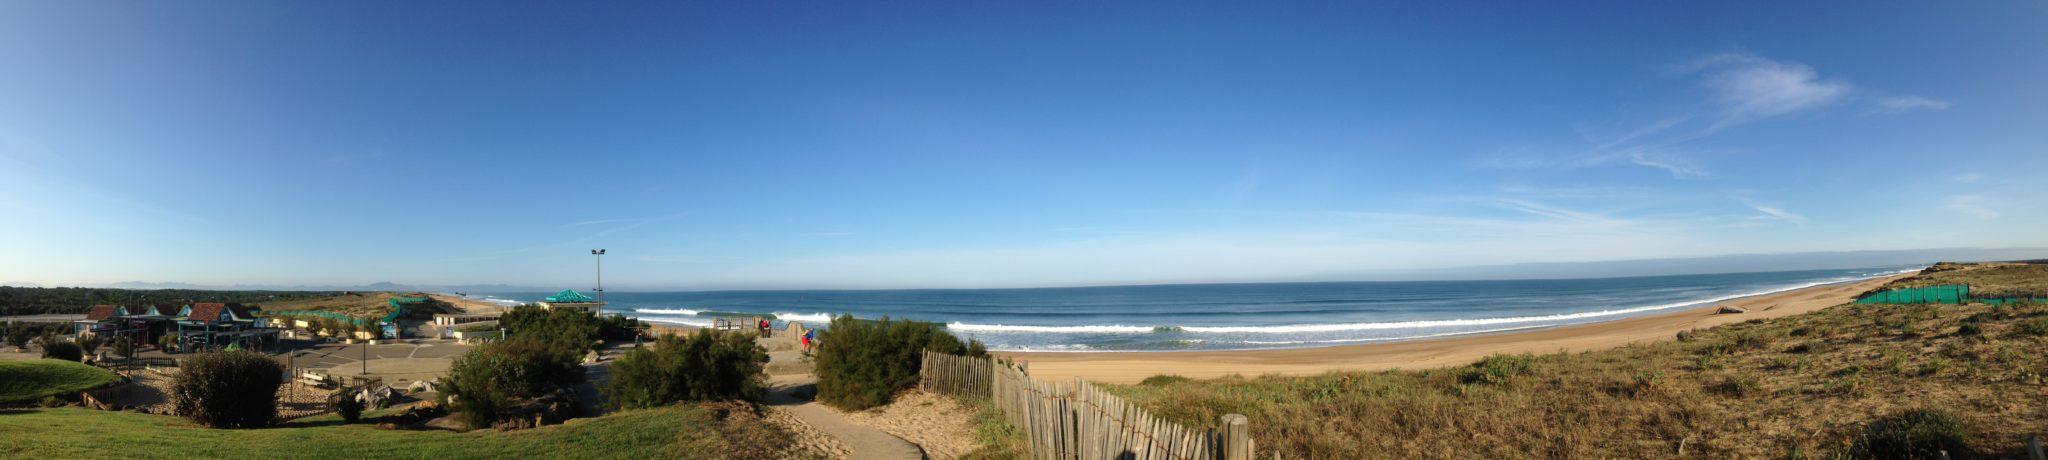 Vue panoramique depuis l'esplanade de la plage